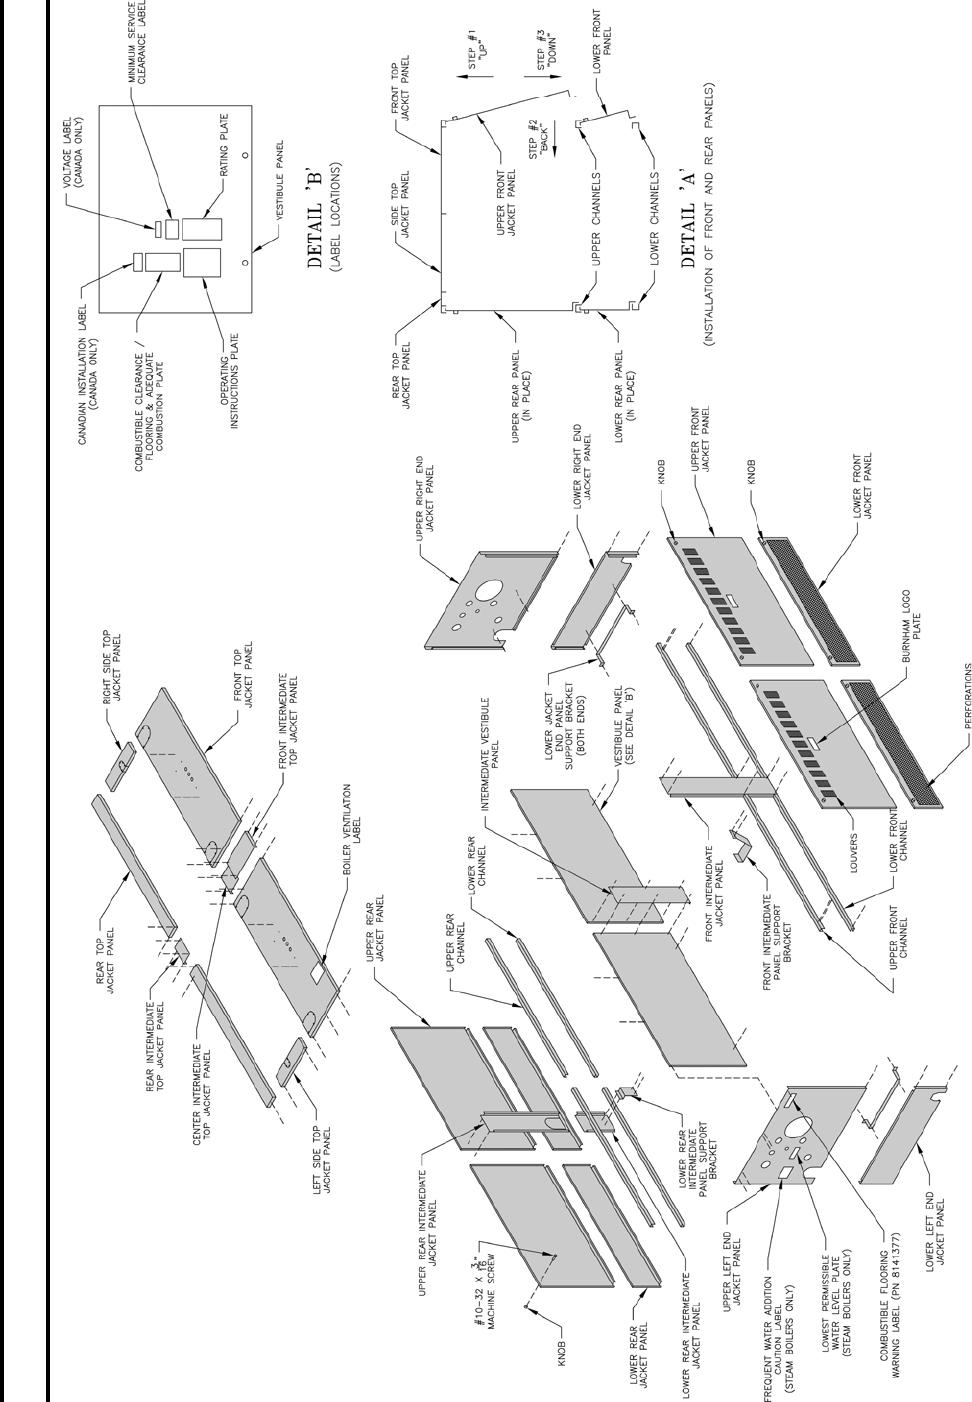 wiring diagram for tado thermostat